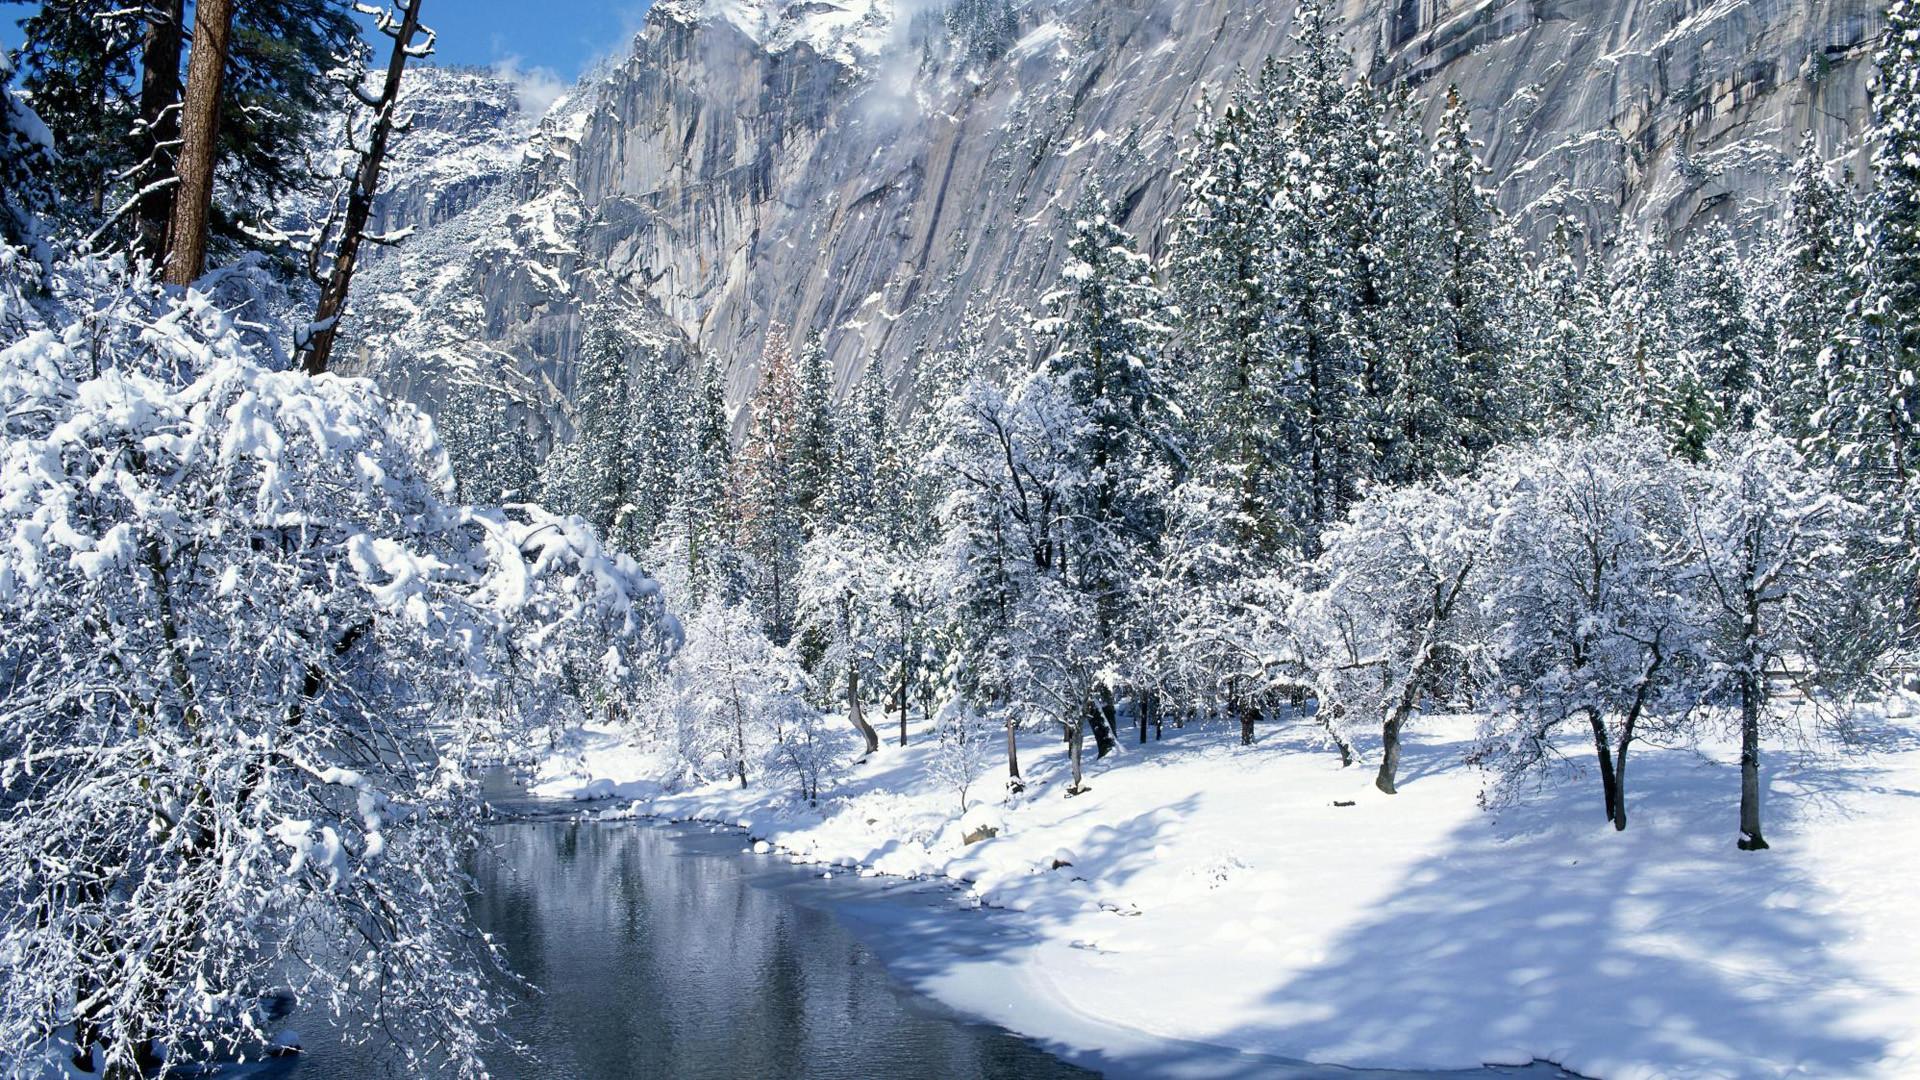 Windows 7 Winter Wallpaper Winter Nature (30 Wallpapers) – HD Wallpapers